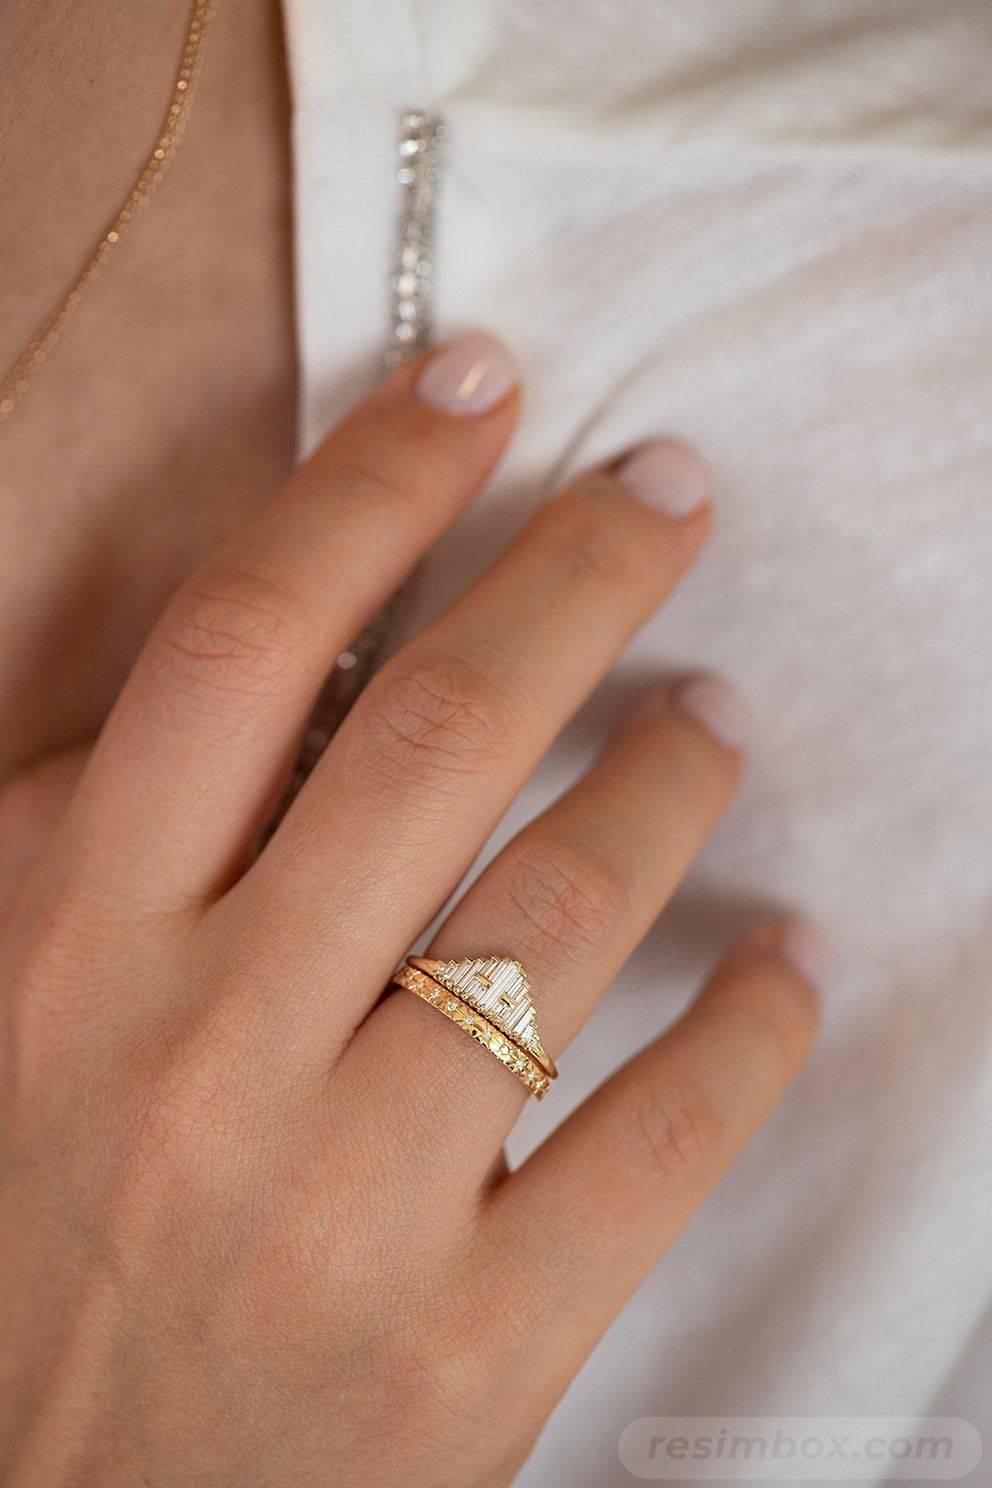 Art deco engagement ring-531143349805140639